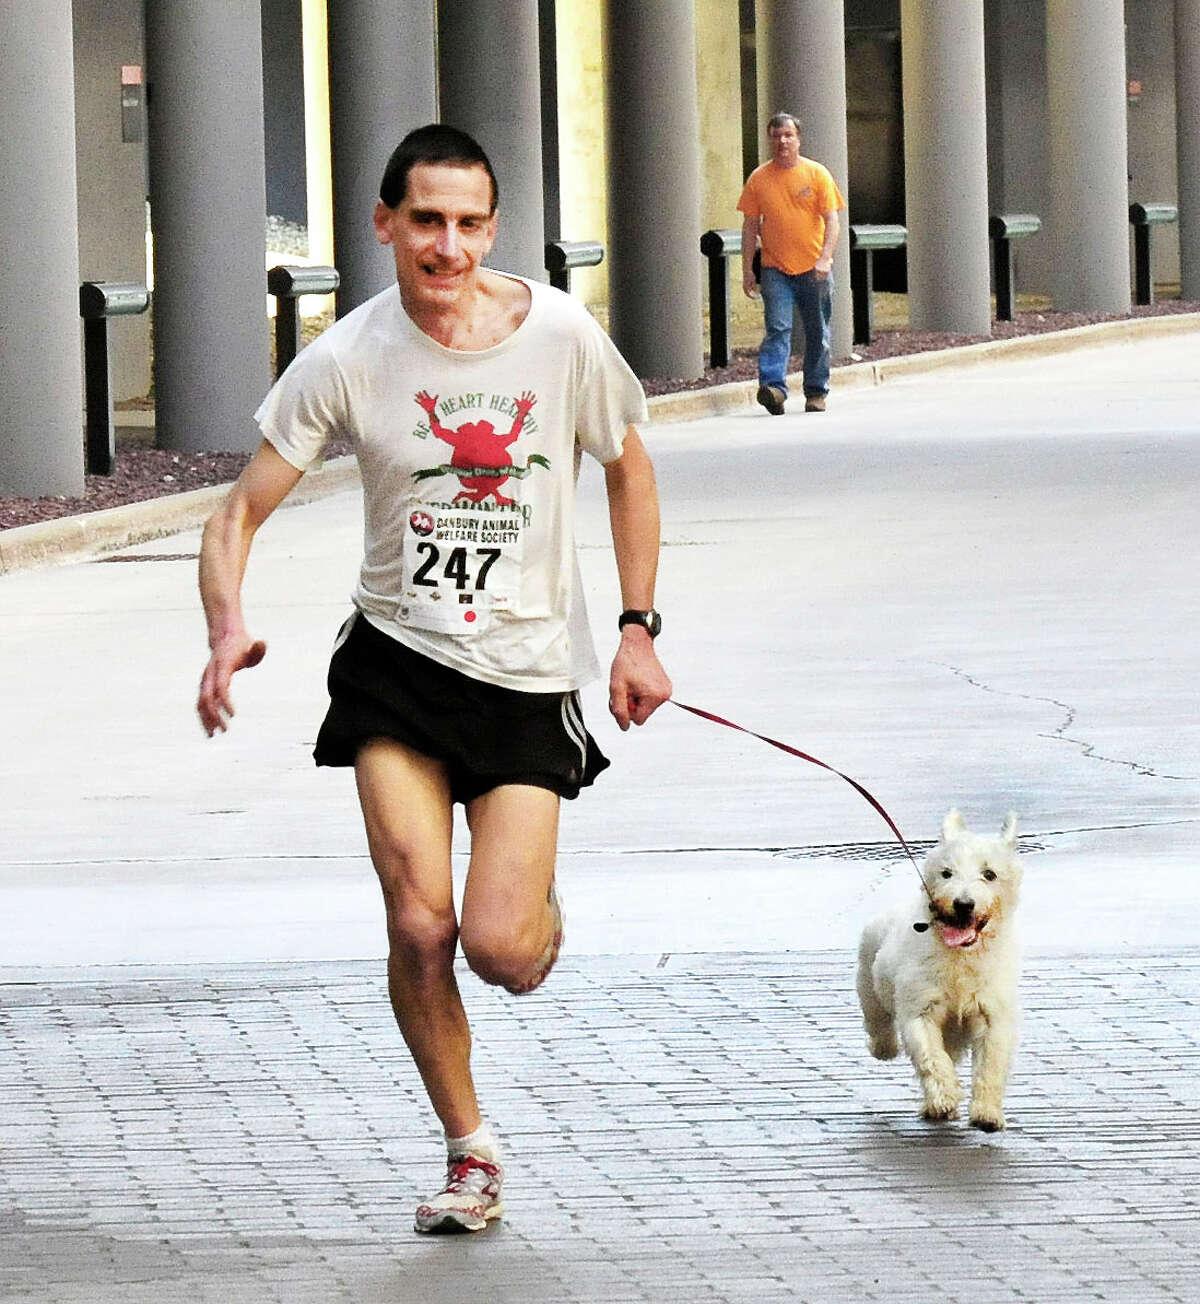 Eric Morse and his dog, Murdock, win the Danbury Animal Welfare Society's